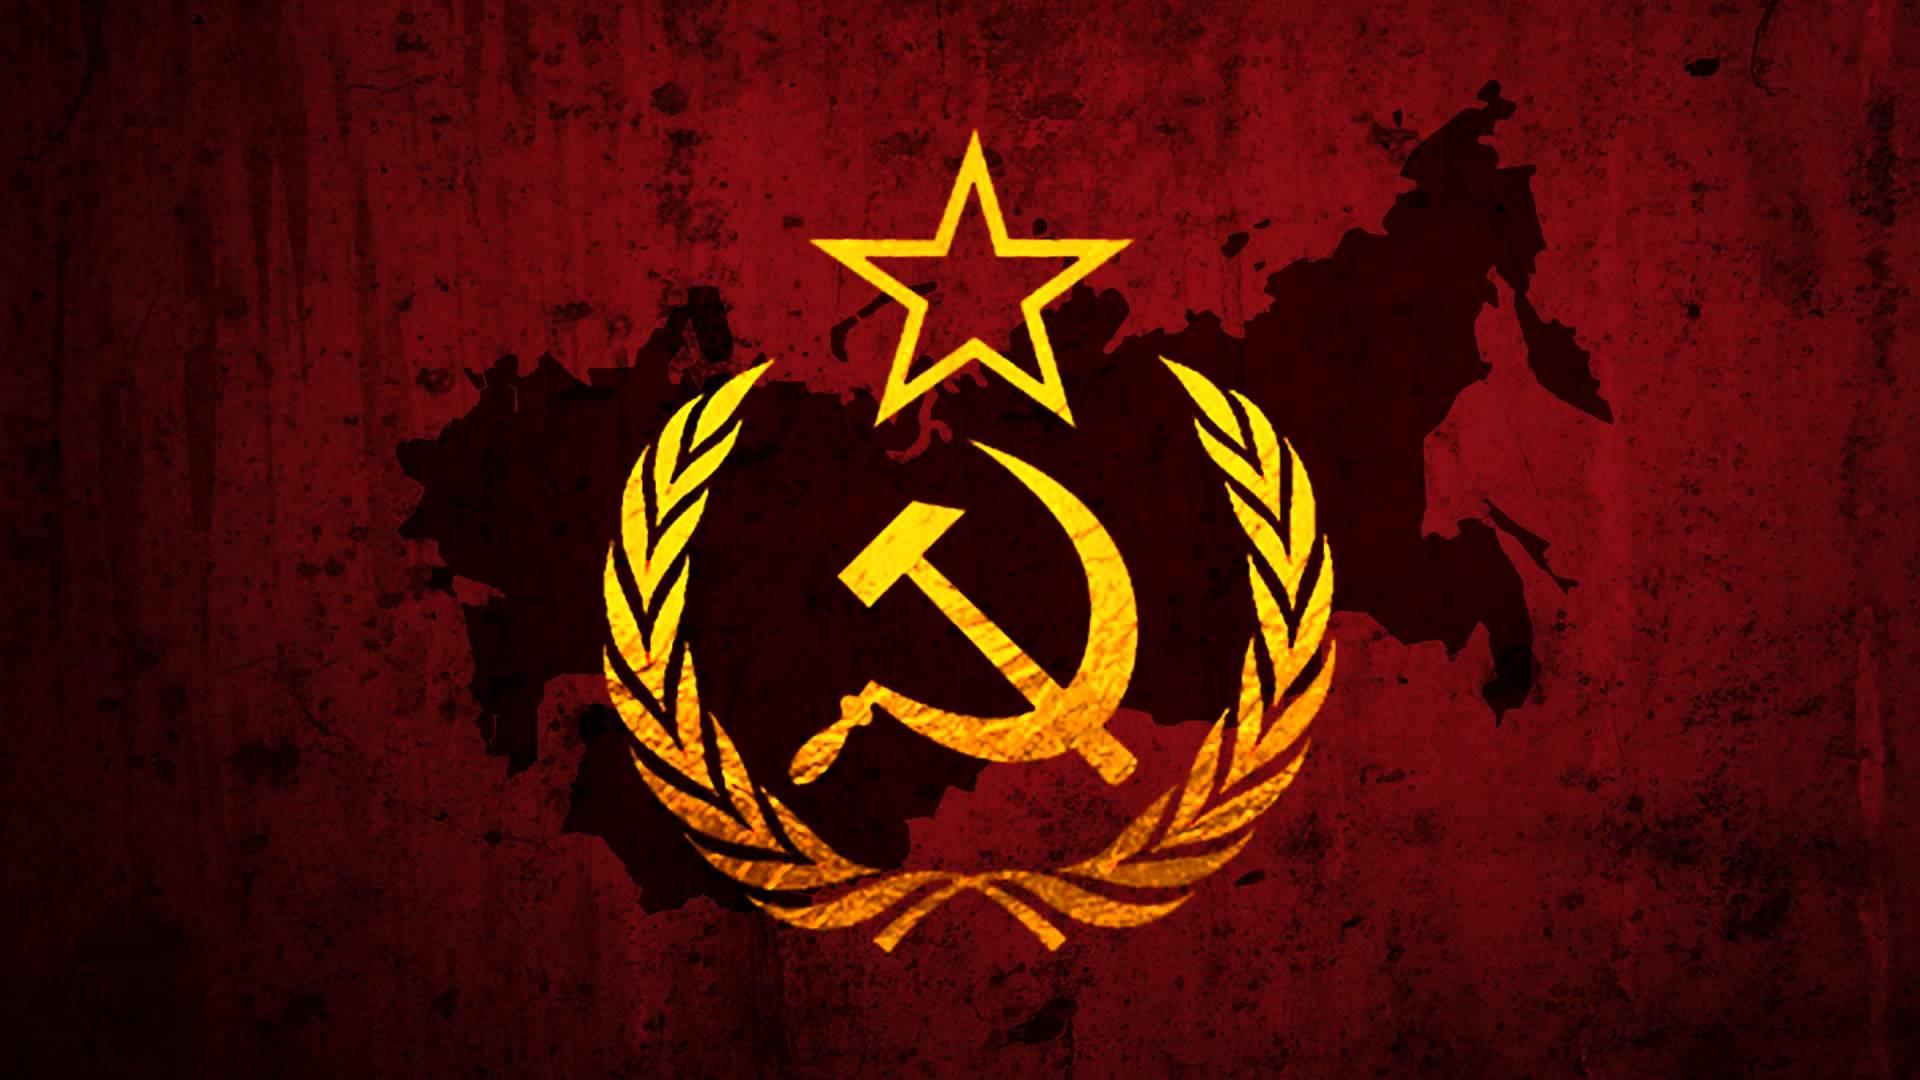 73+] Red Army Wallpaper on WallpaperSafari